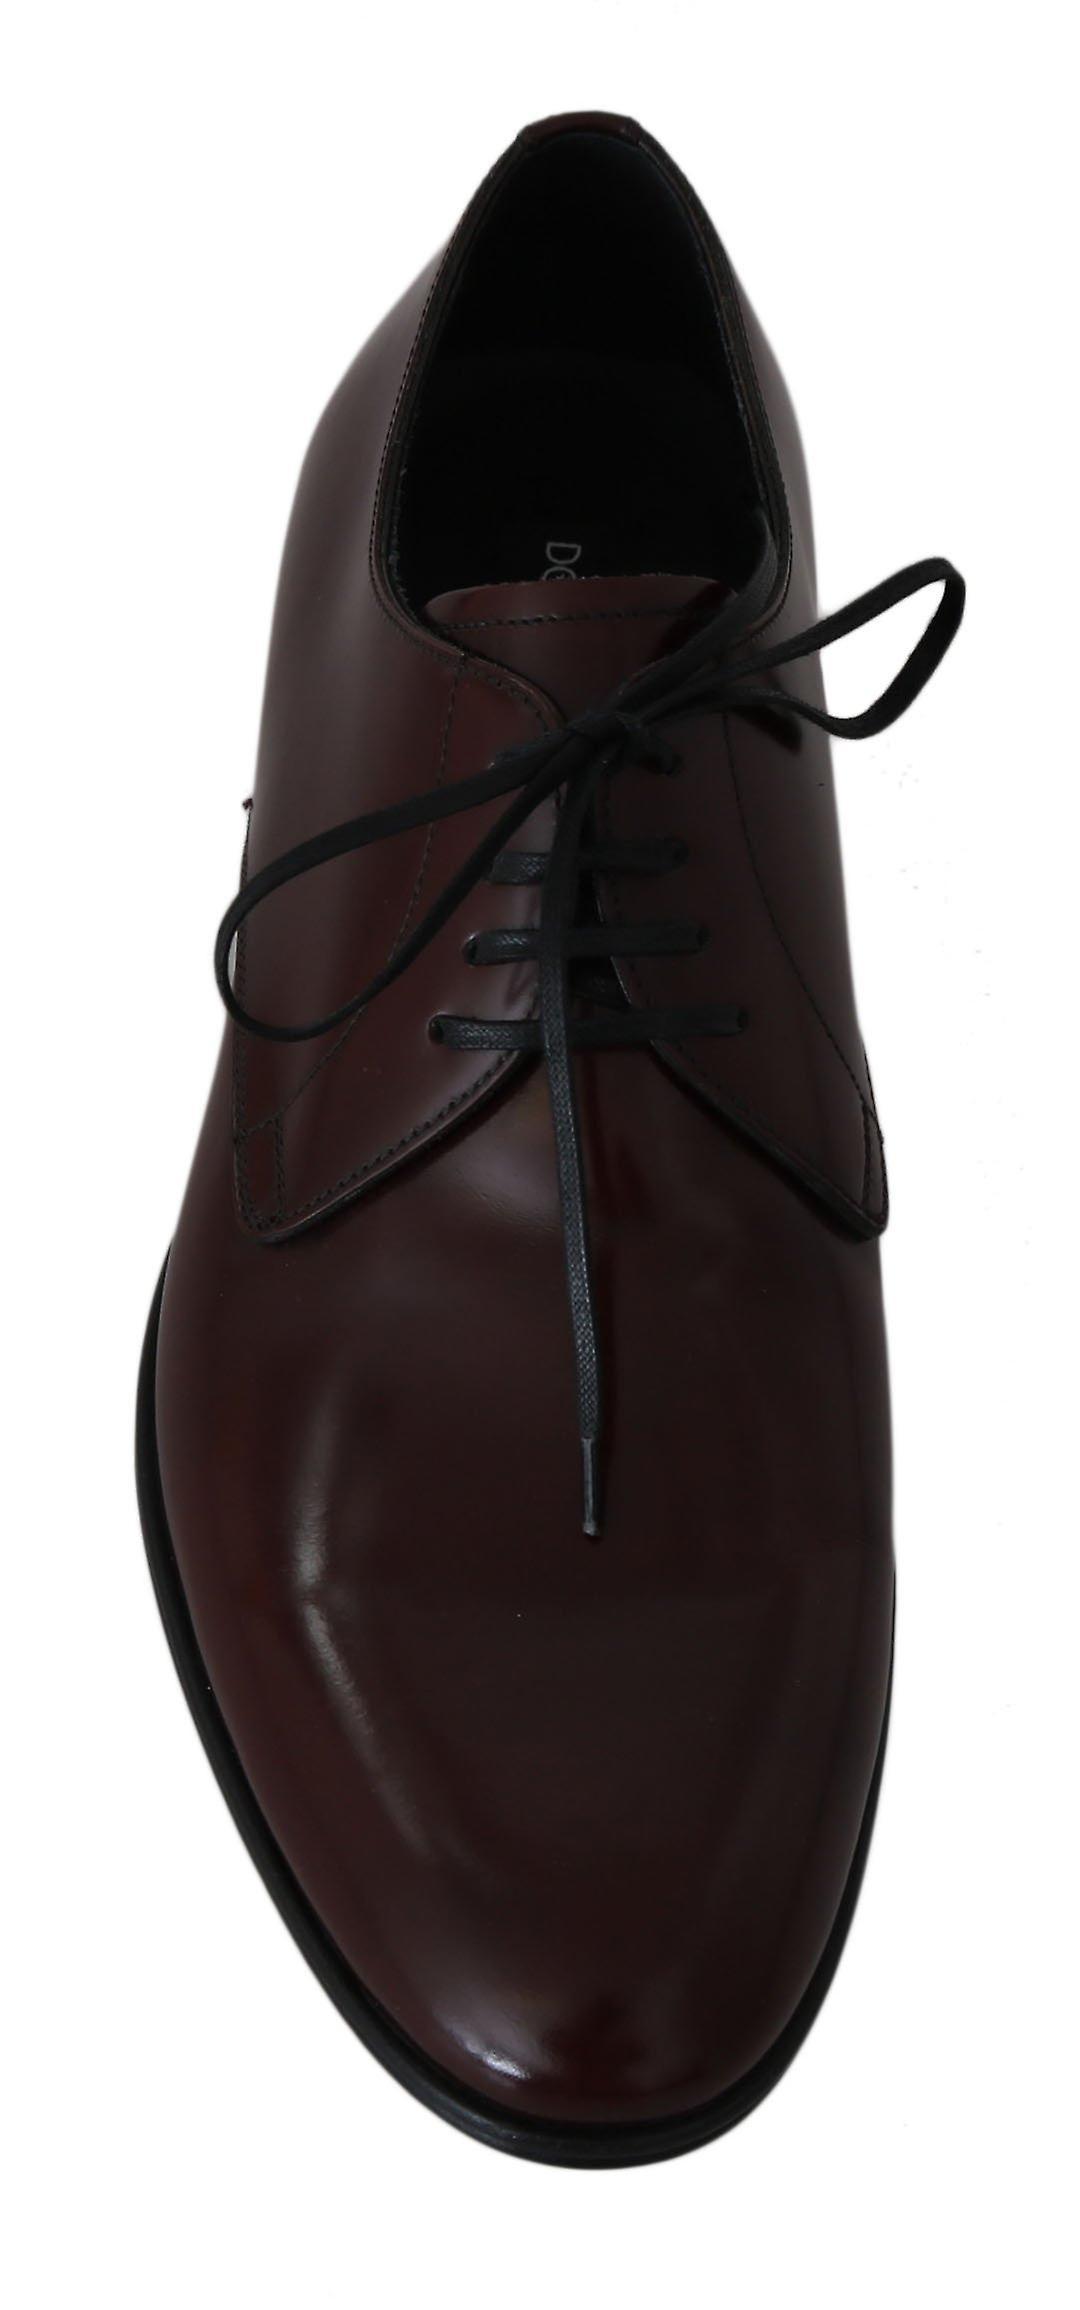 Dolce & Gabbana Red Bordeaux Leather Derby Dress Shoes MV2374-42